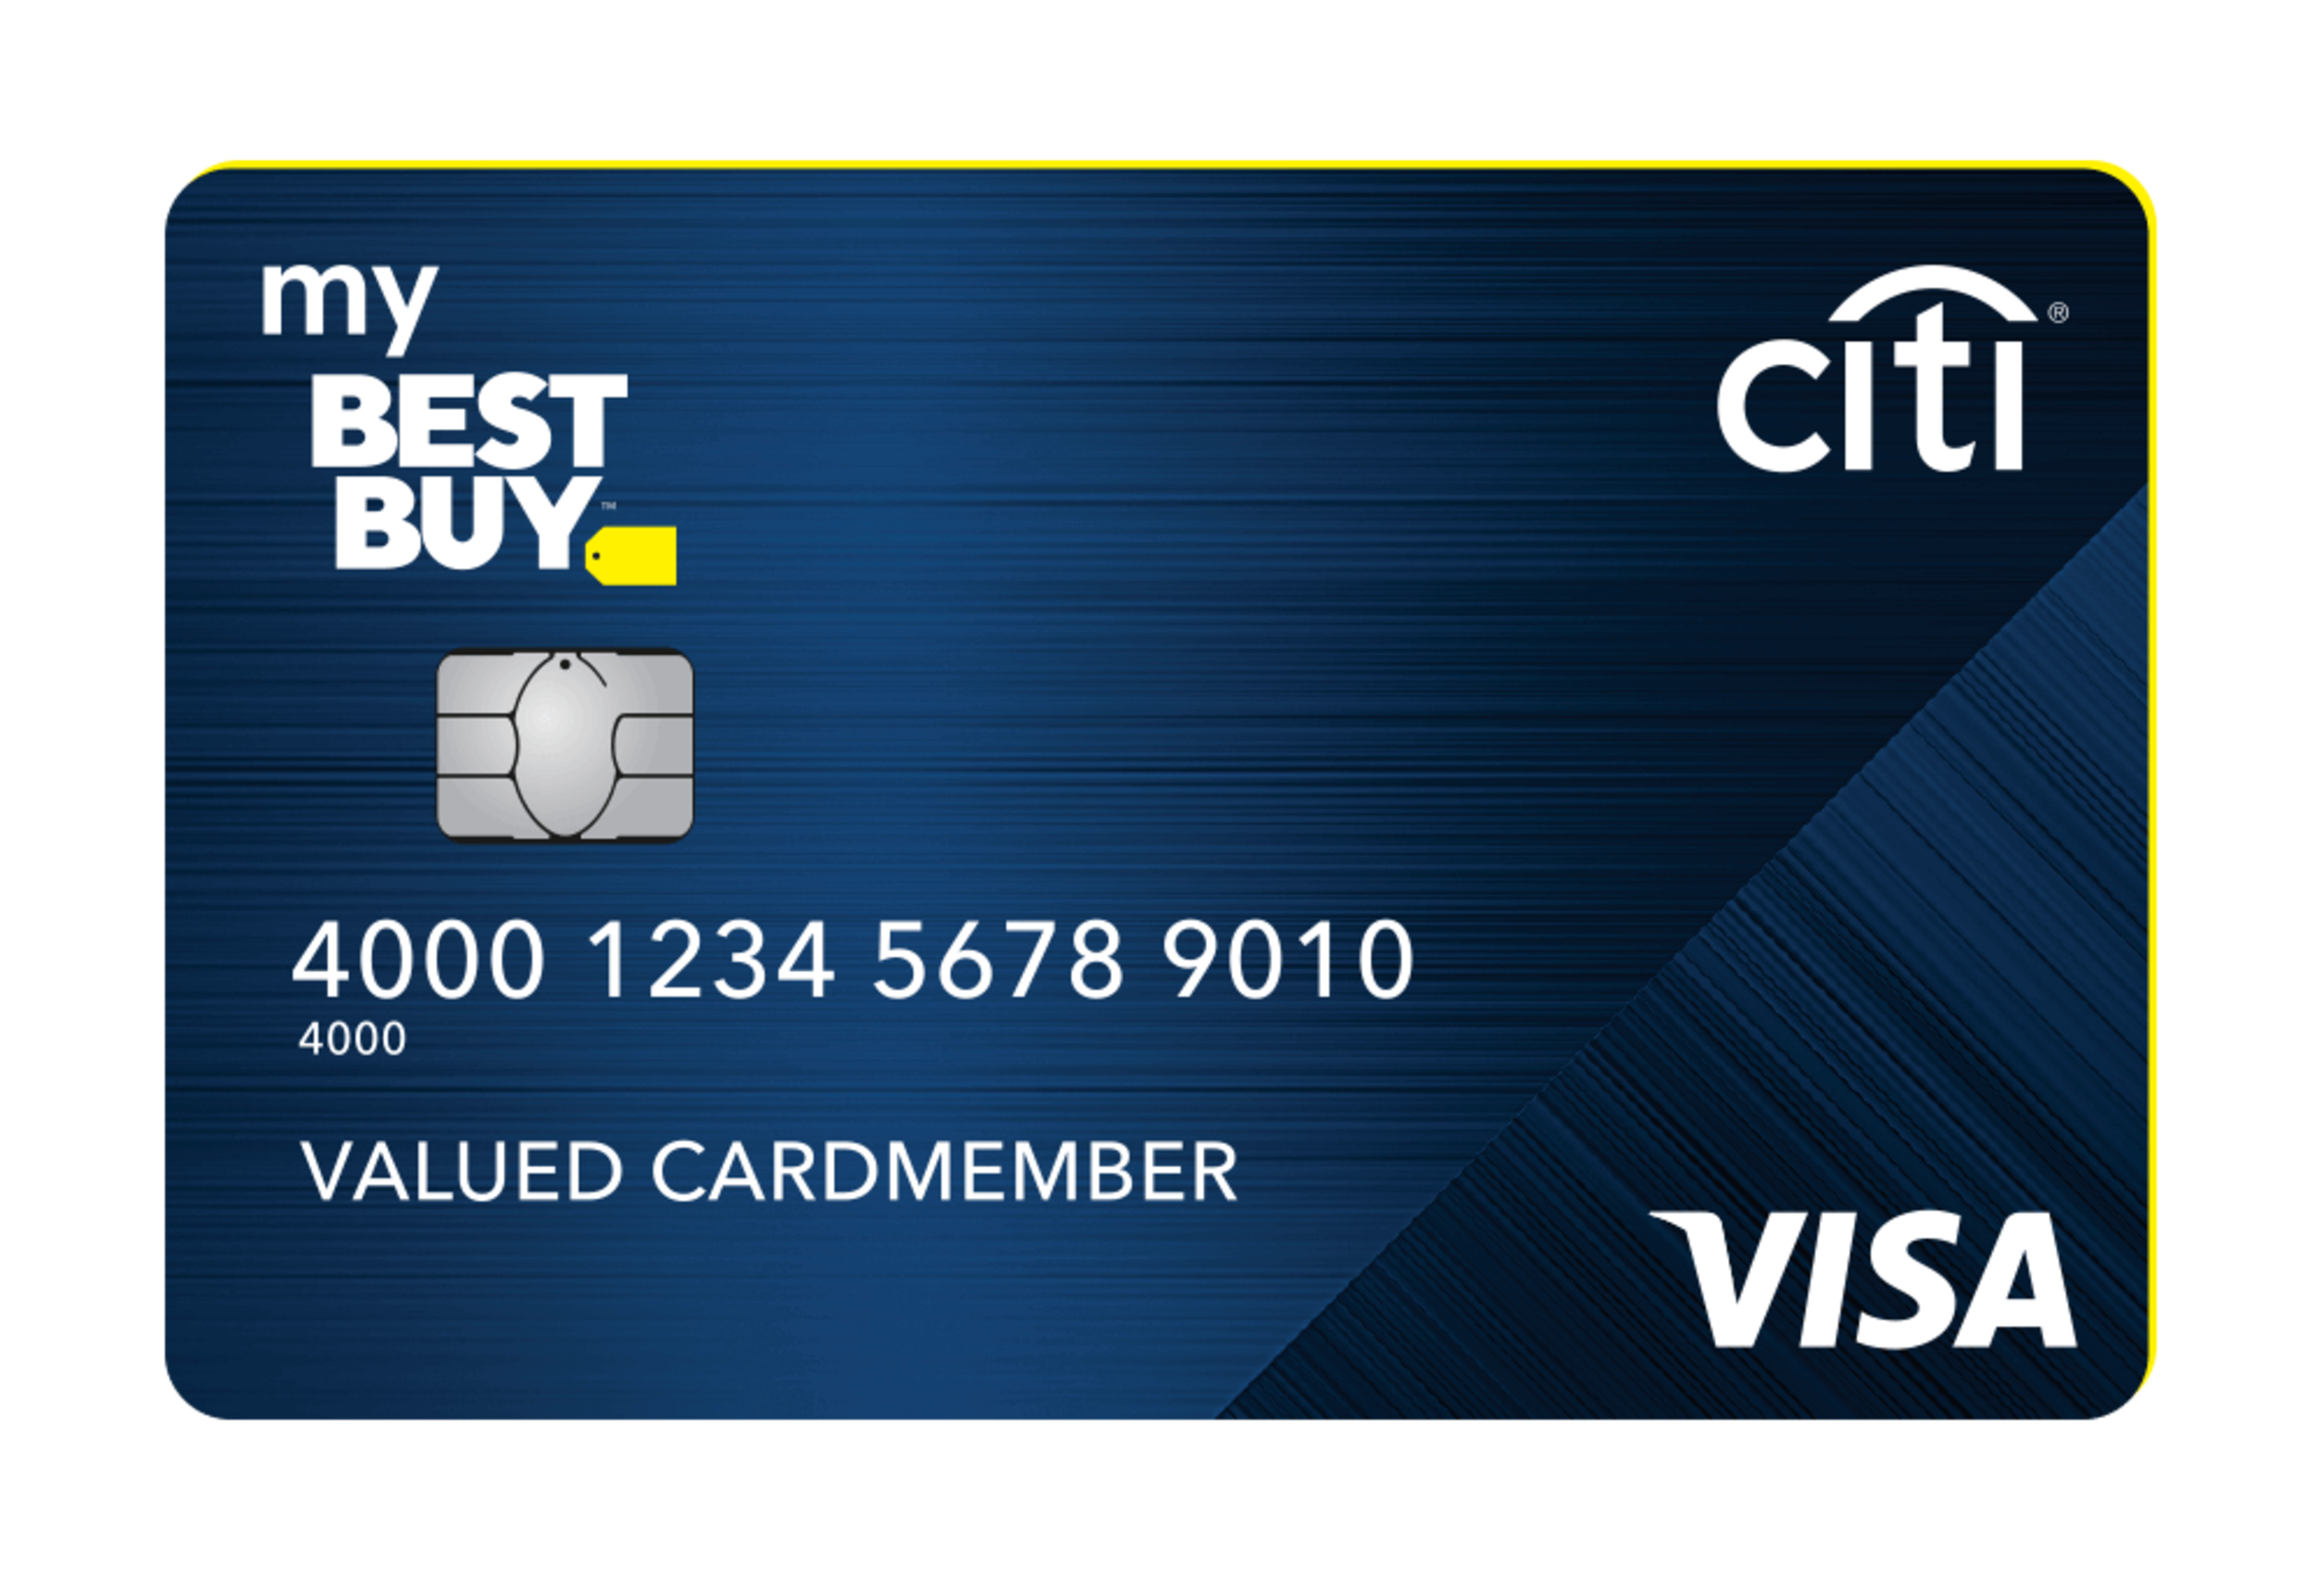 Consolidate My Best Buy Visa Card Balance